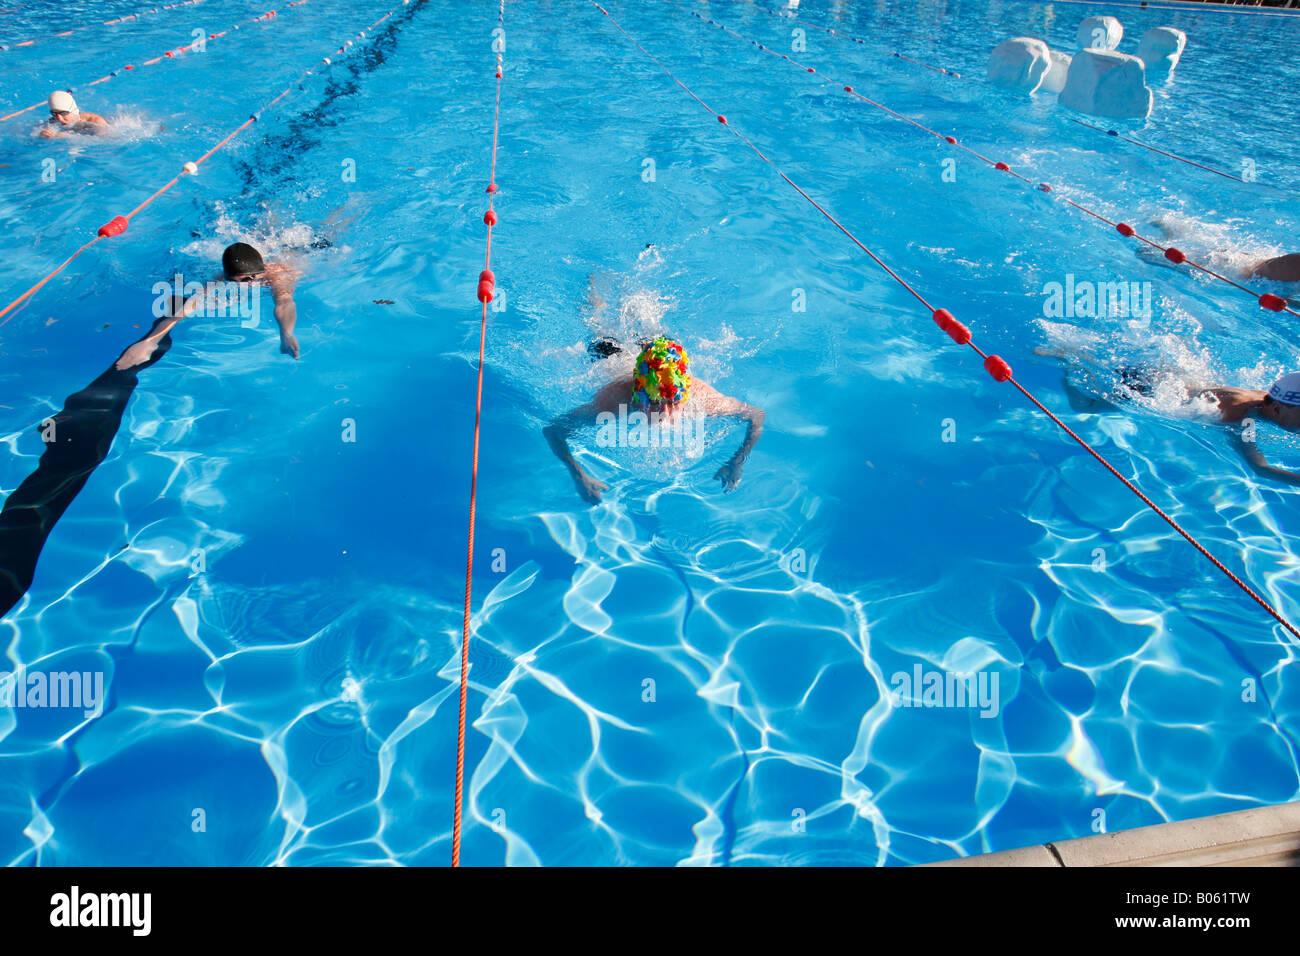 Men swim in Tooting Bec Lido outdoor swimming pool - Stock Image